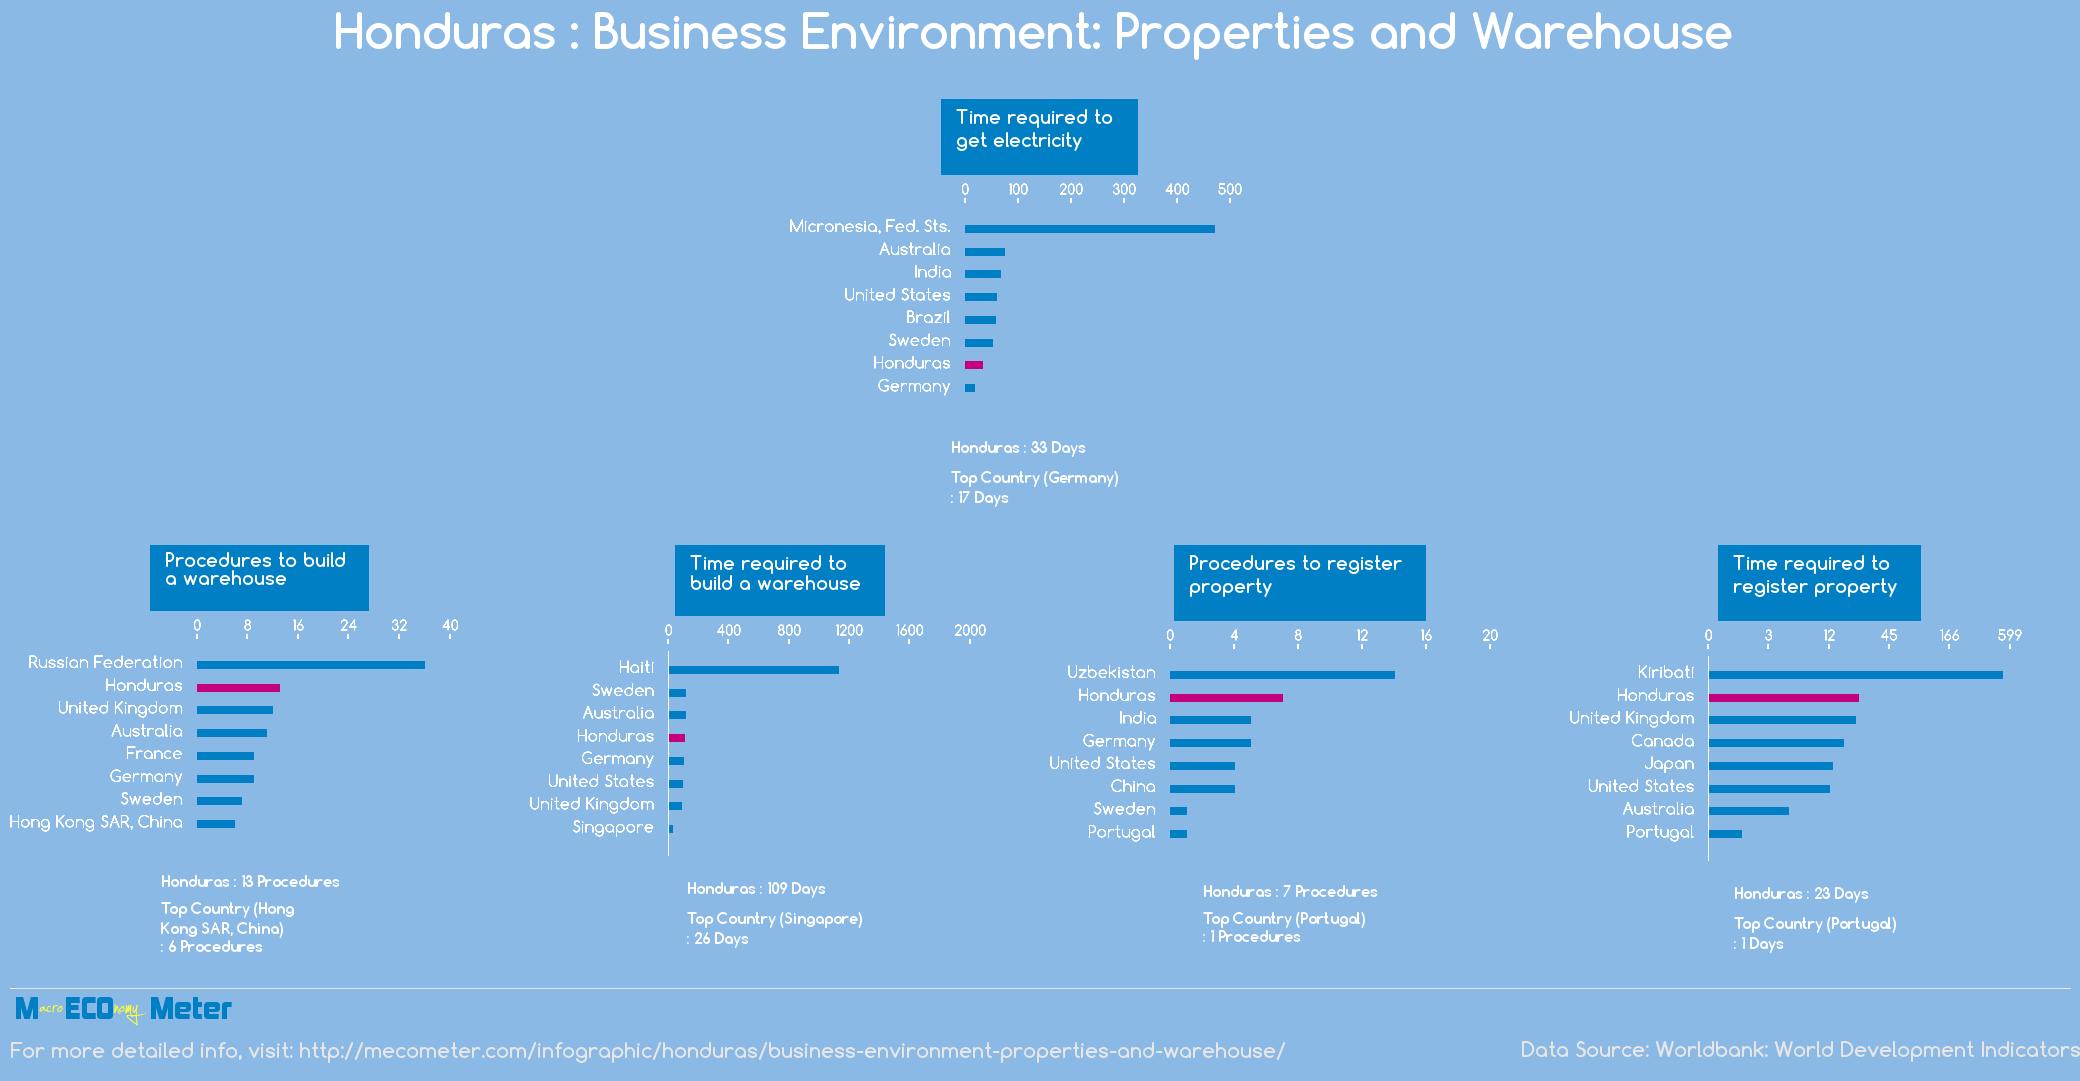 Honduras : Business Environment: Properties and Warehouse